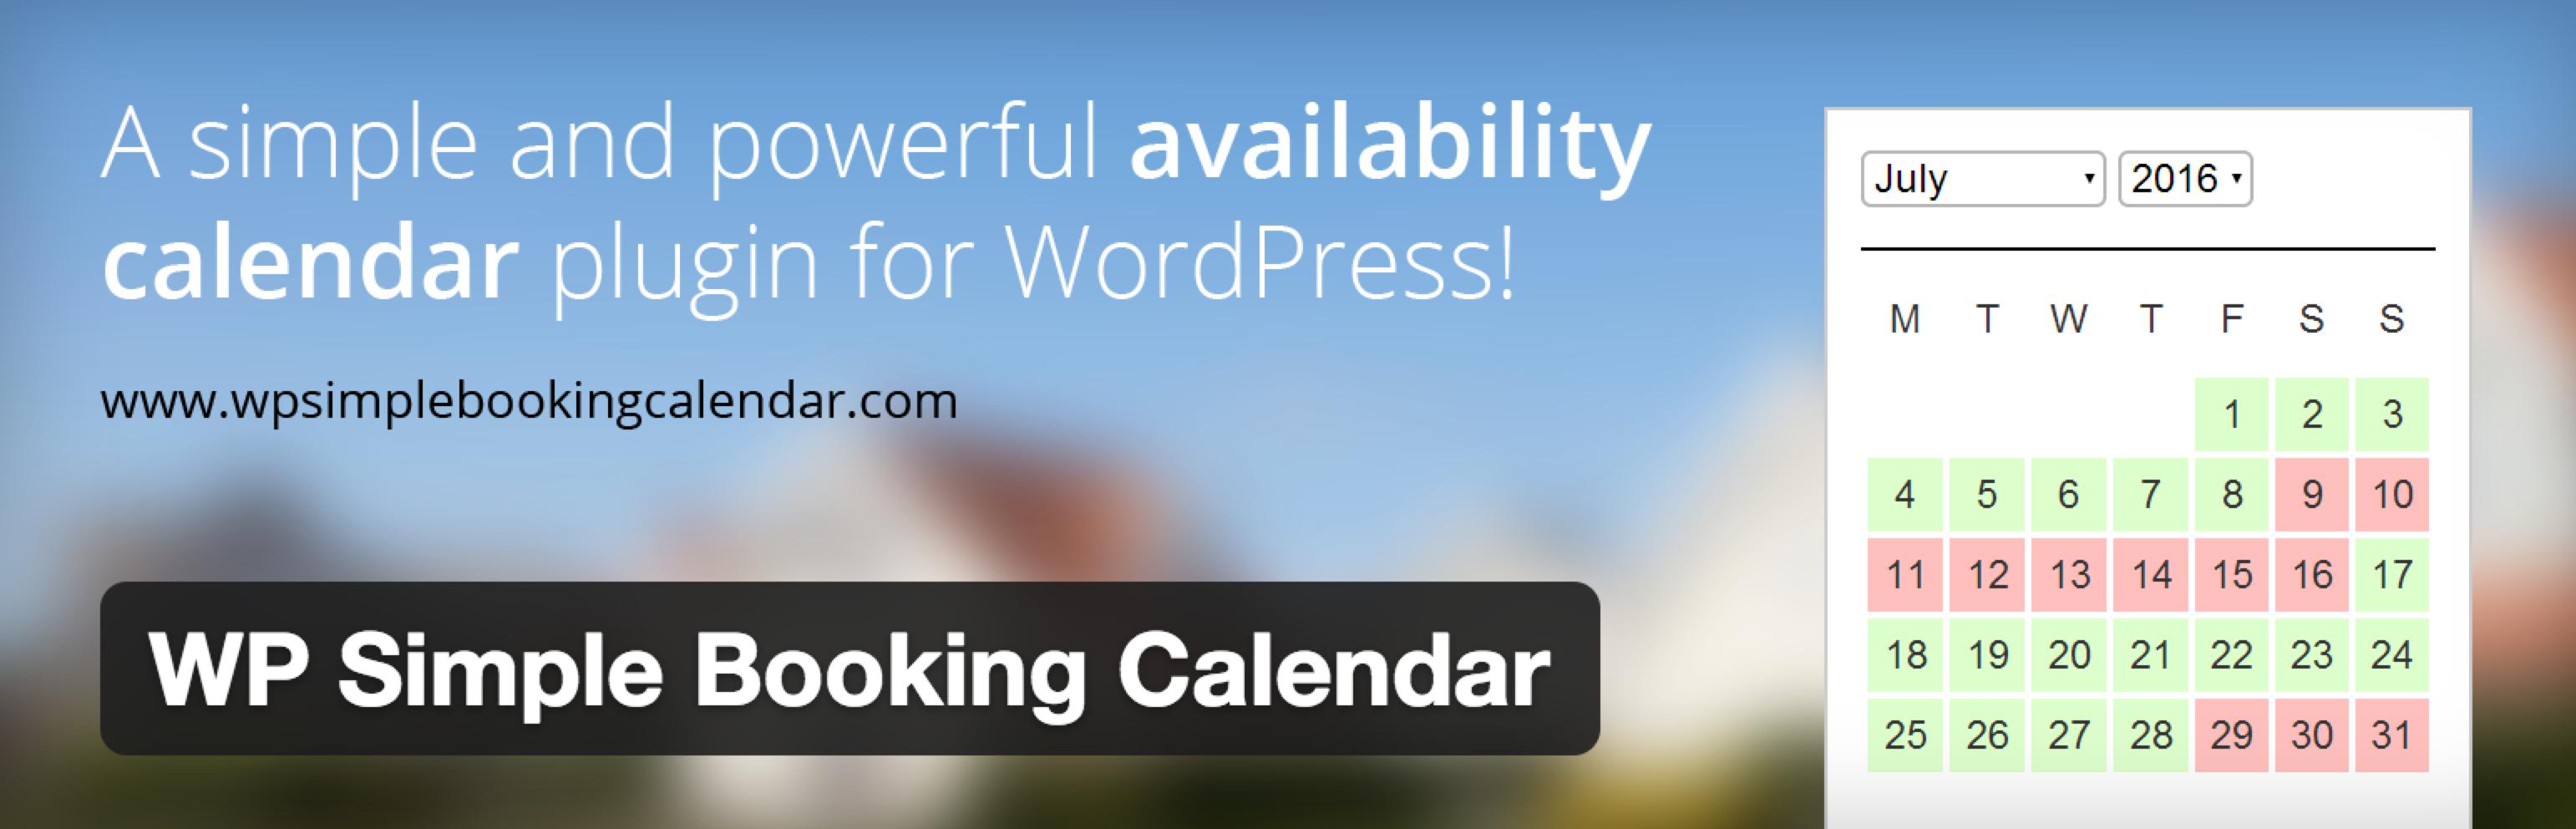 Calendar Booking Plugin Wordpress : Wp simple booking calendar ein simples belegungsplan plugin